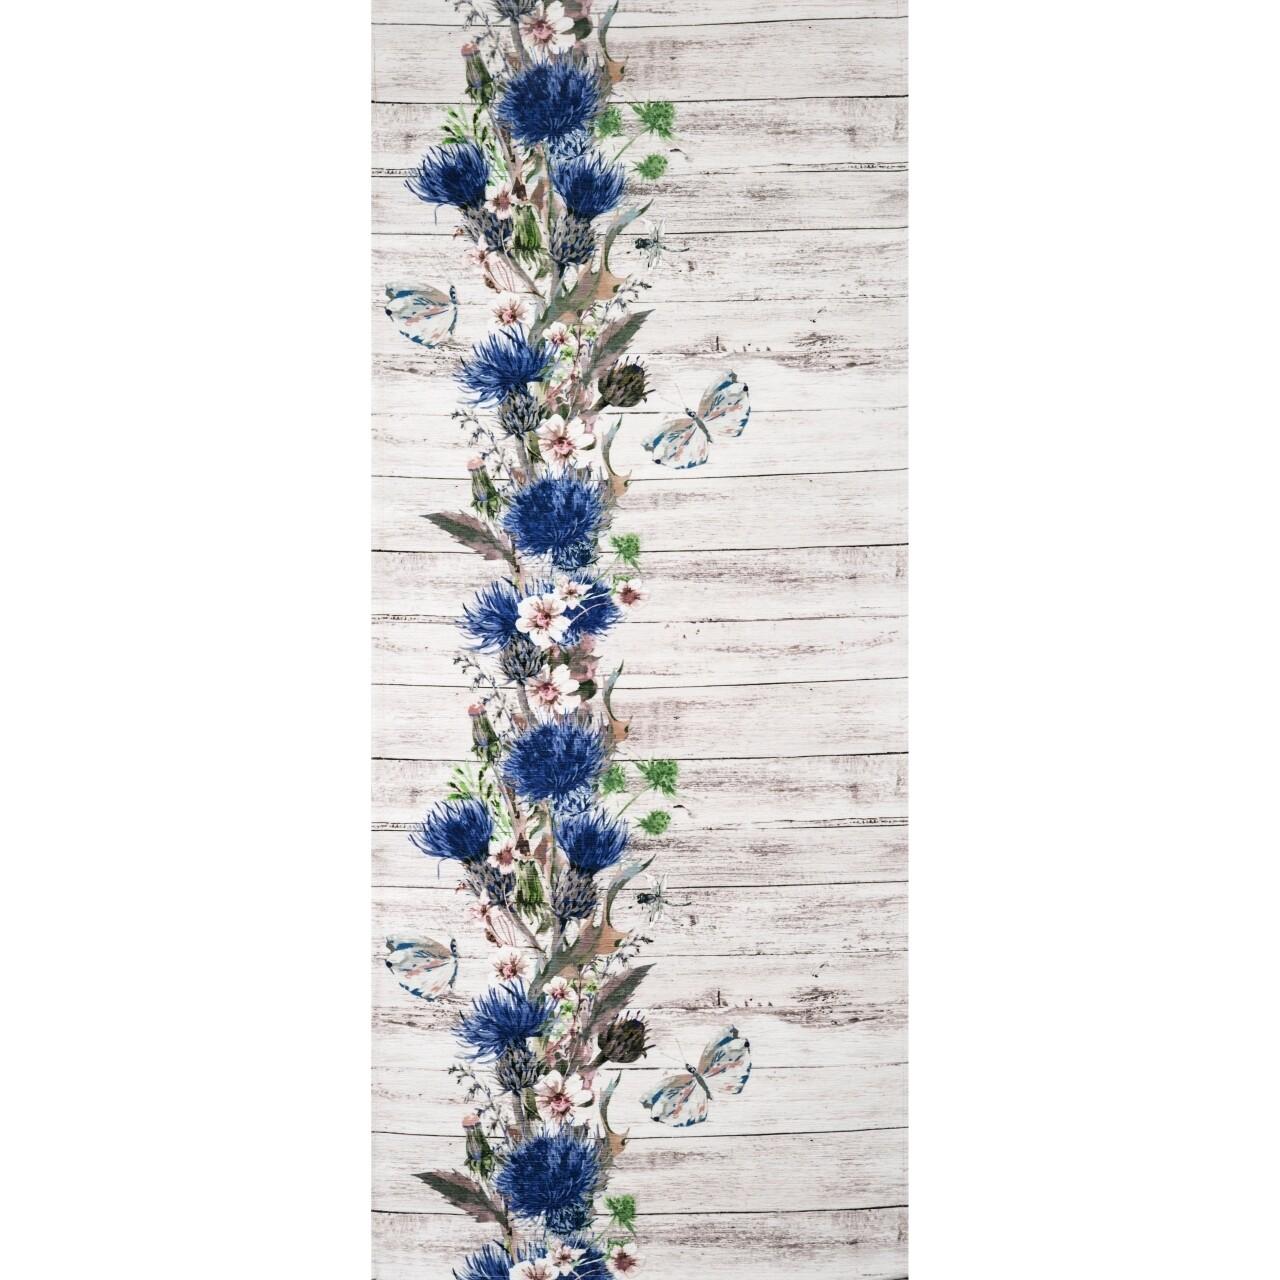 Covor rezistent Webtappeti Fiori Selvatici 58x115 cm, multicolor